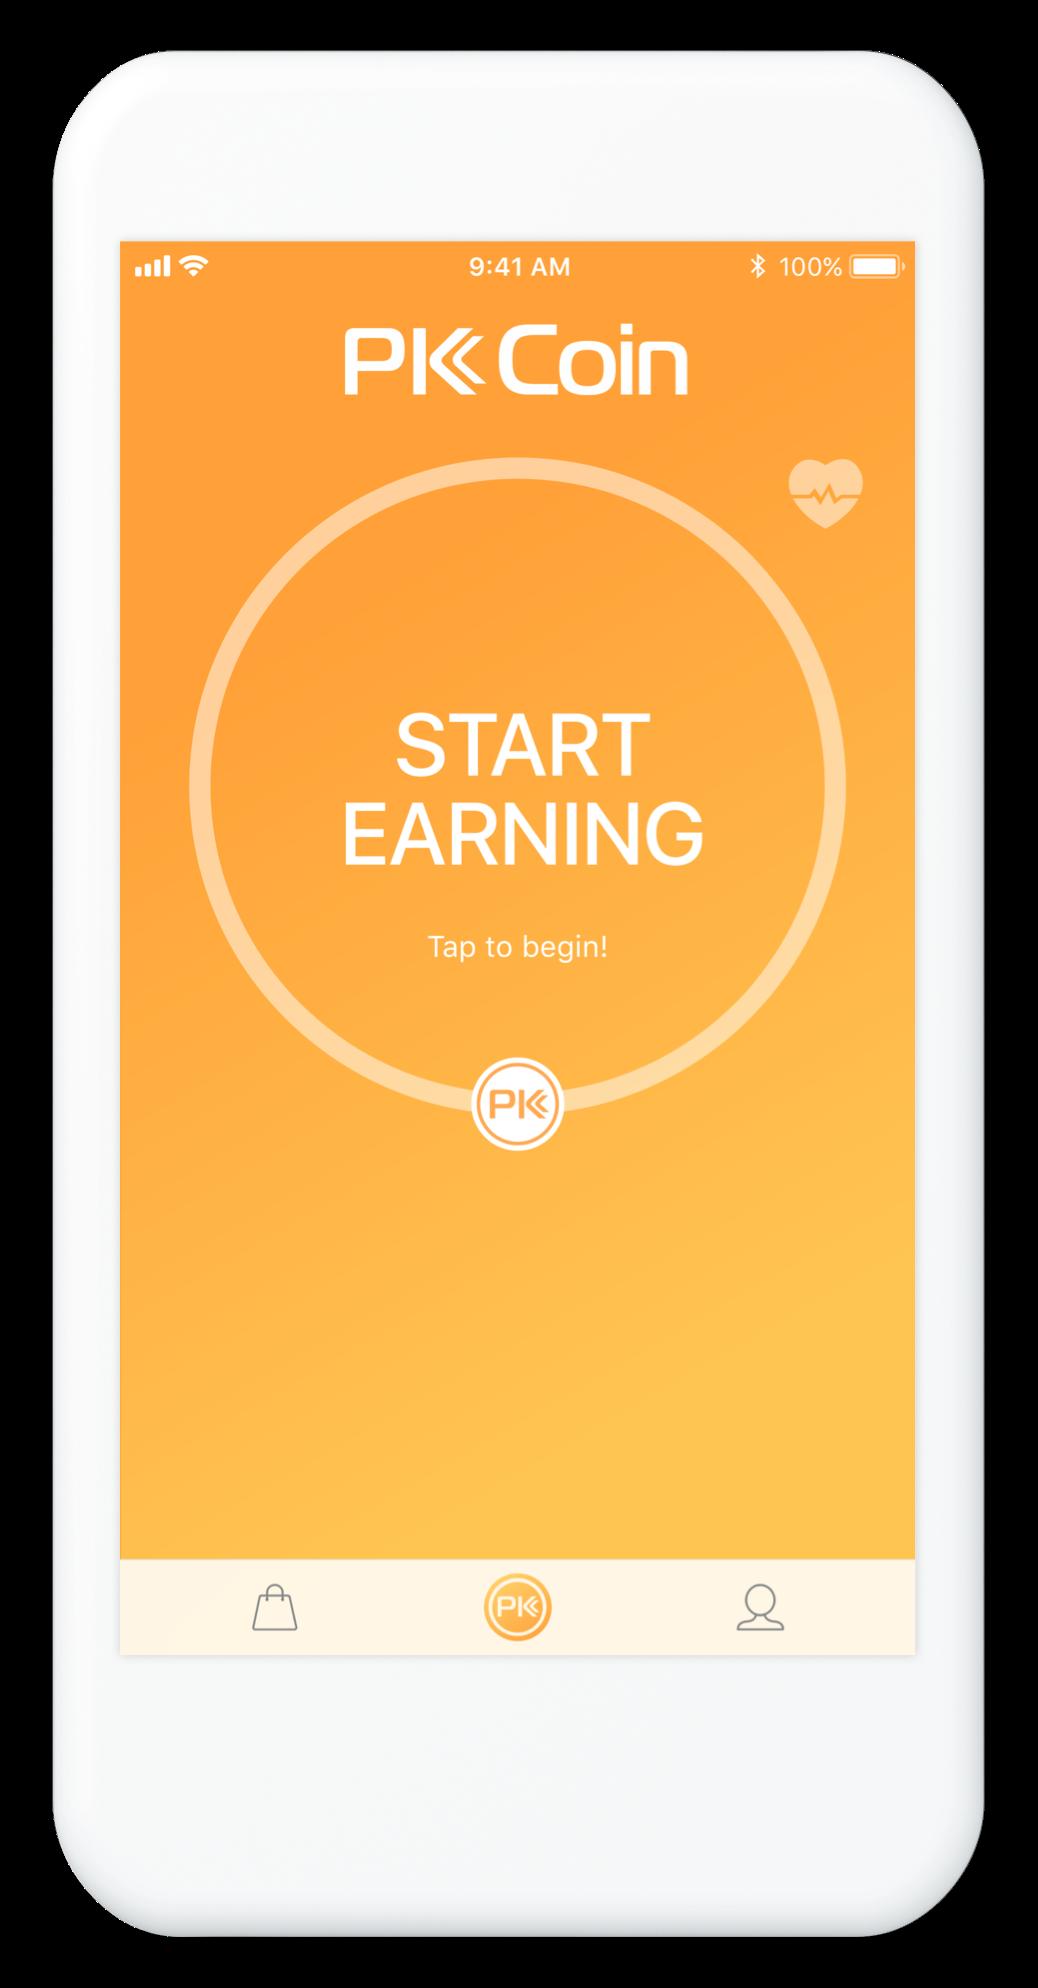 pkcoin_workout_start.png